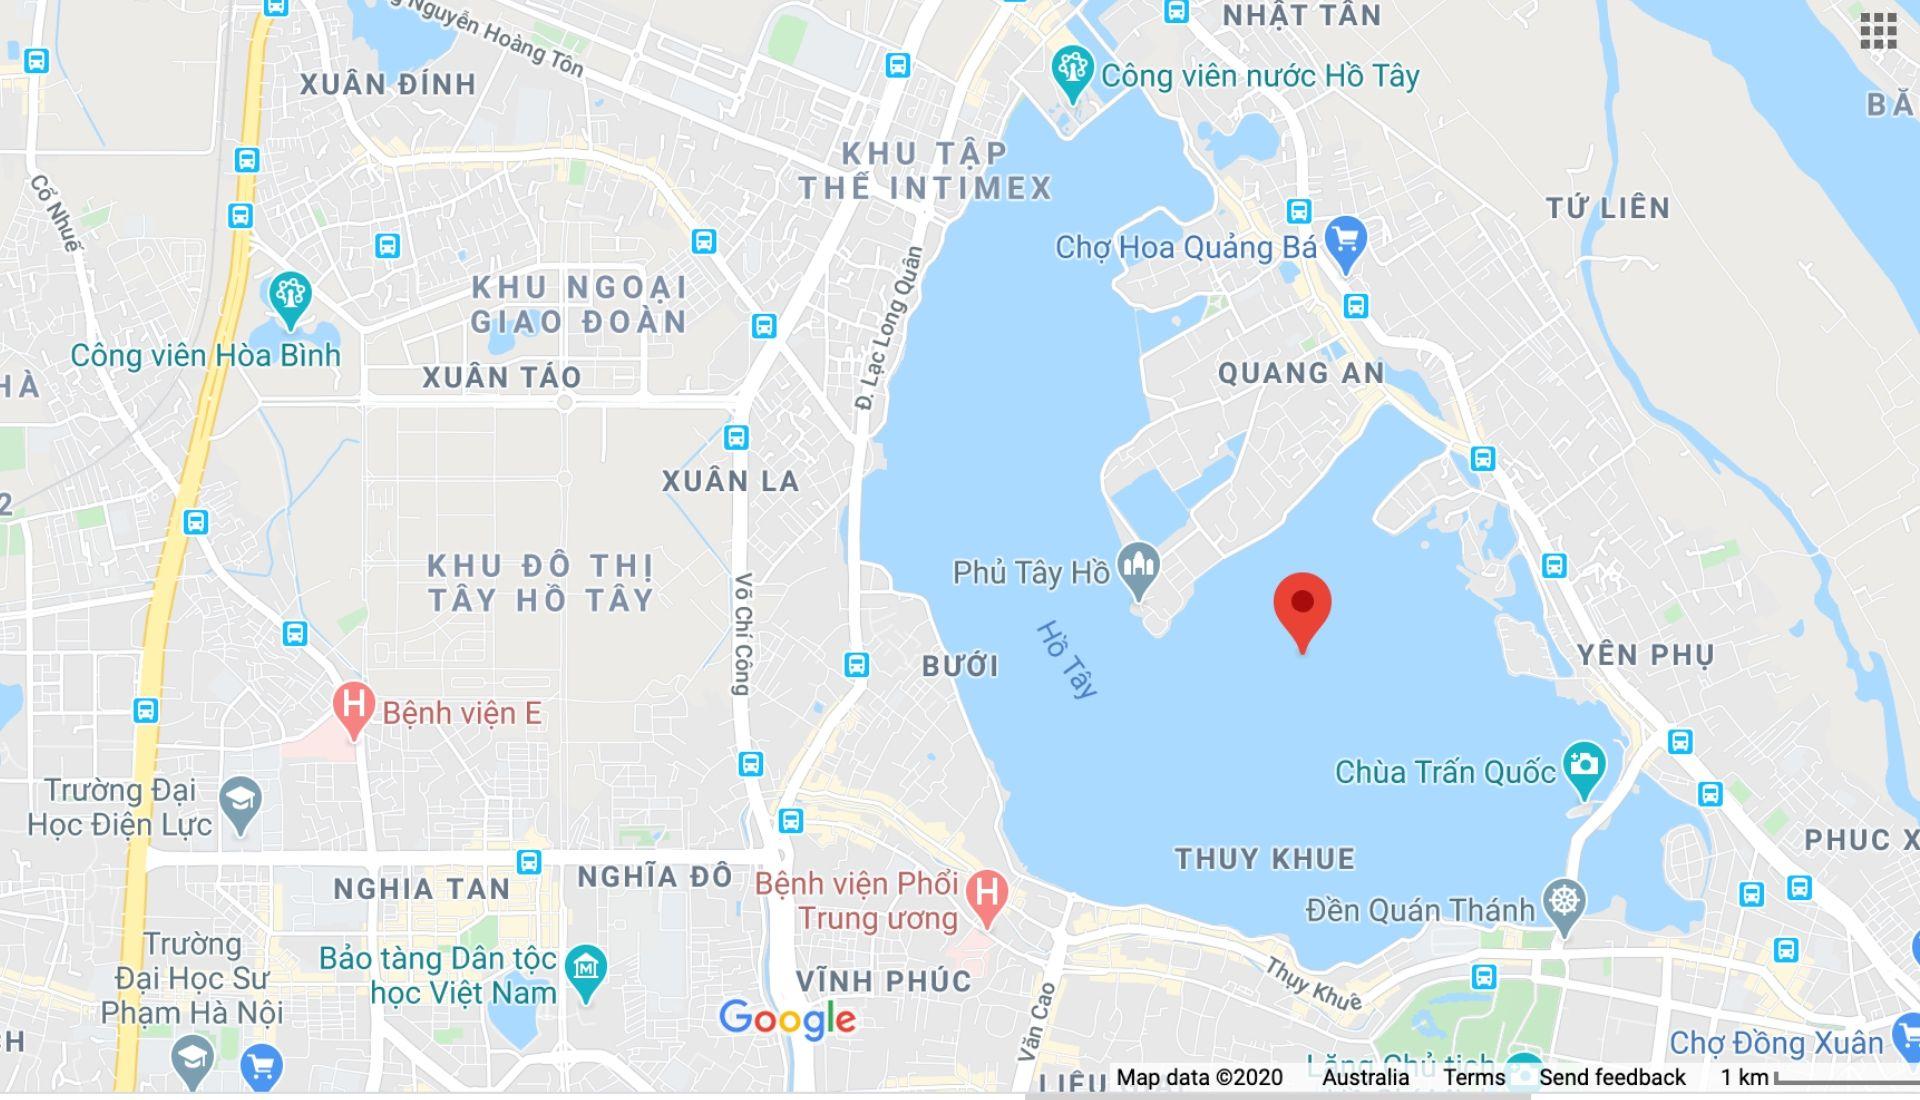 West Lake Map Hanoi